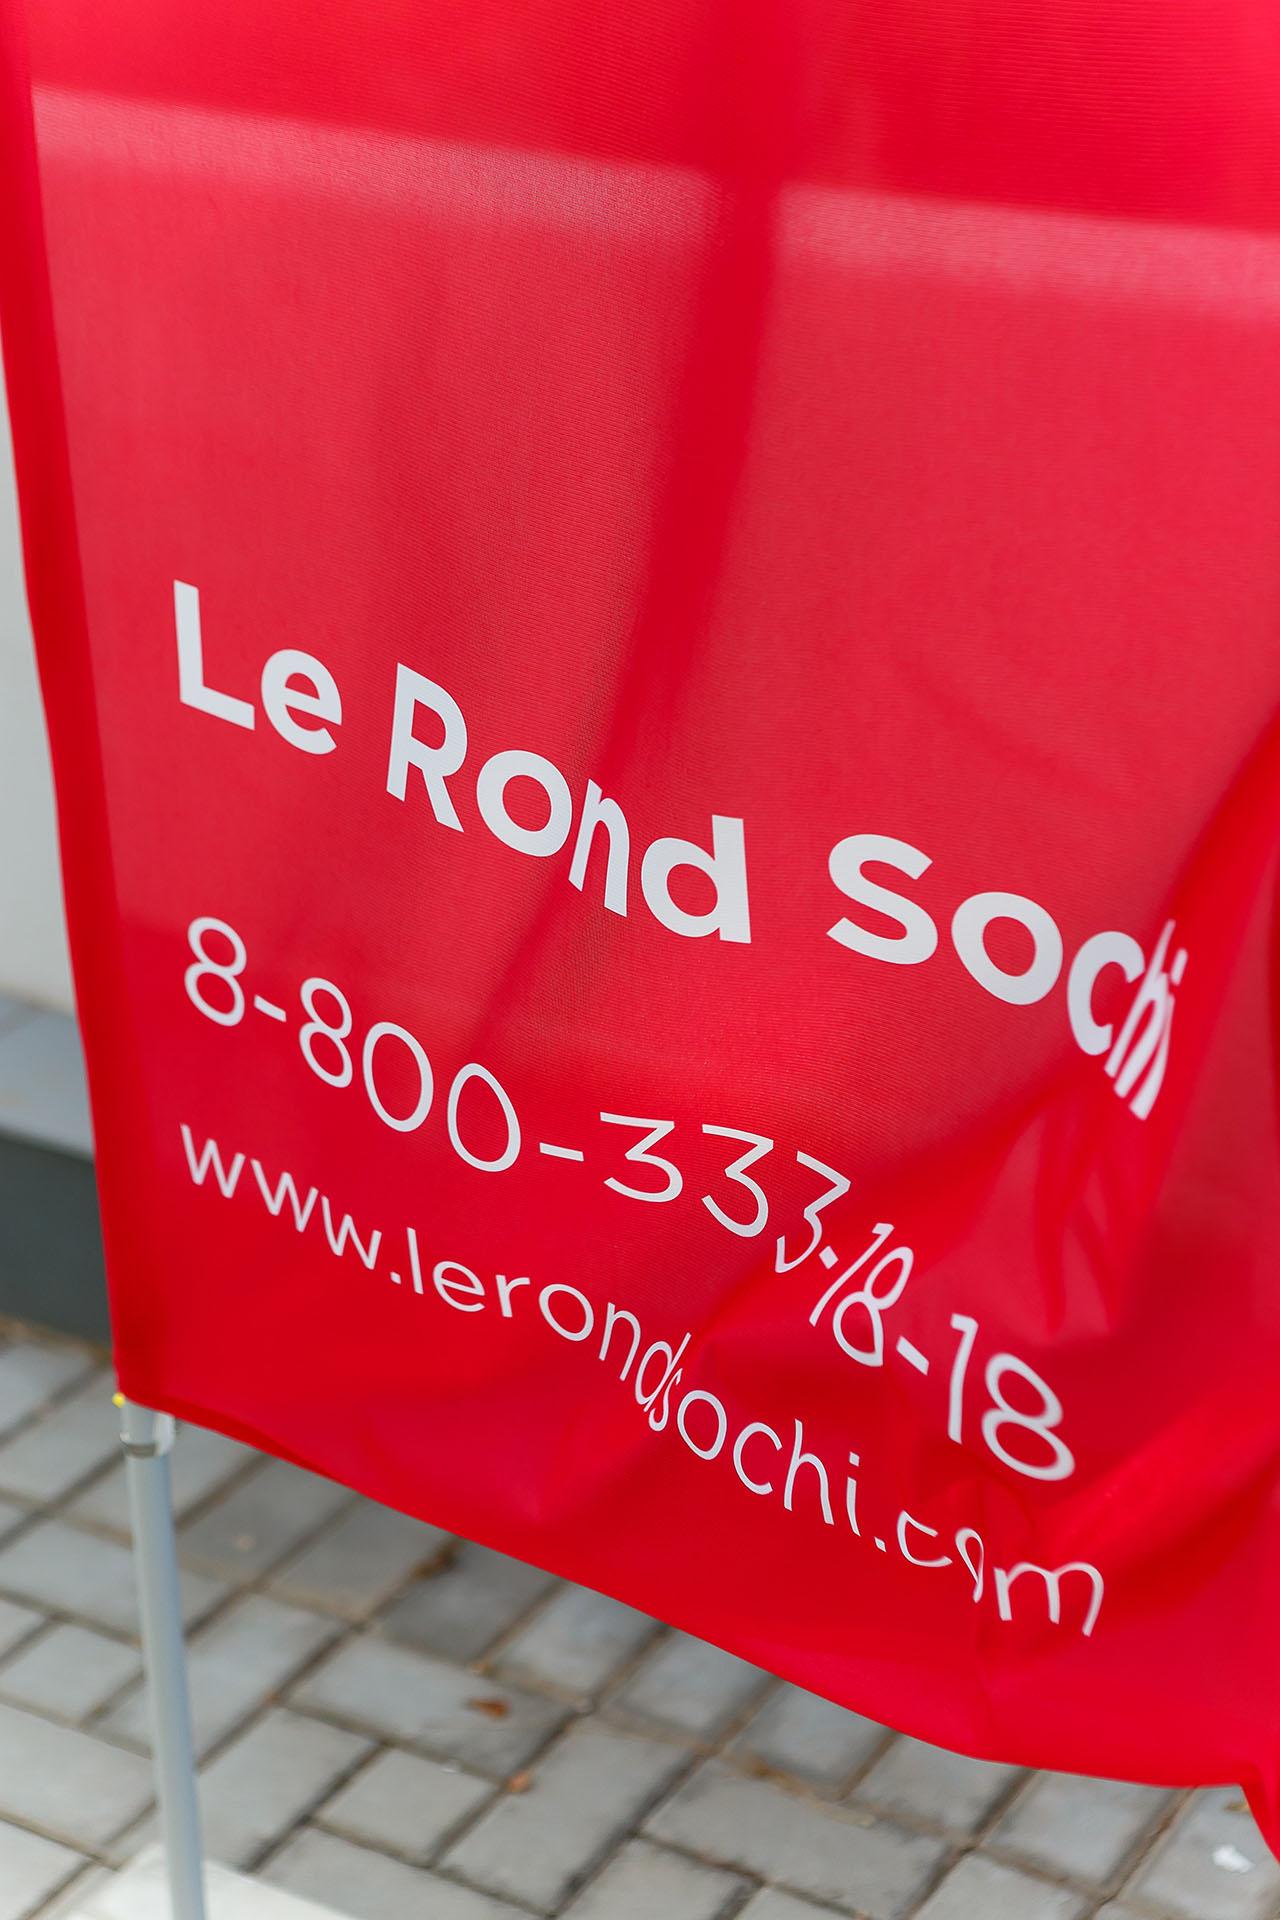 Офис продаж Adagio Le Rond Sochi